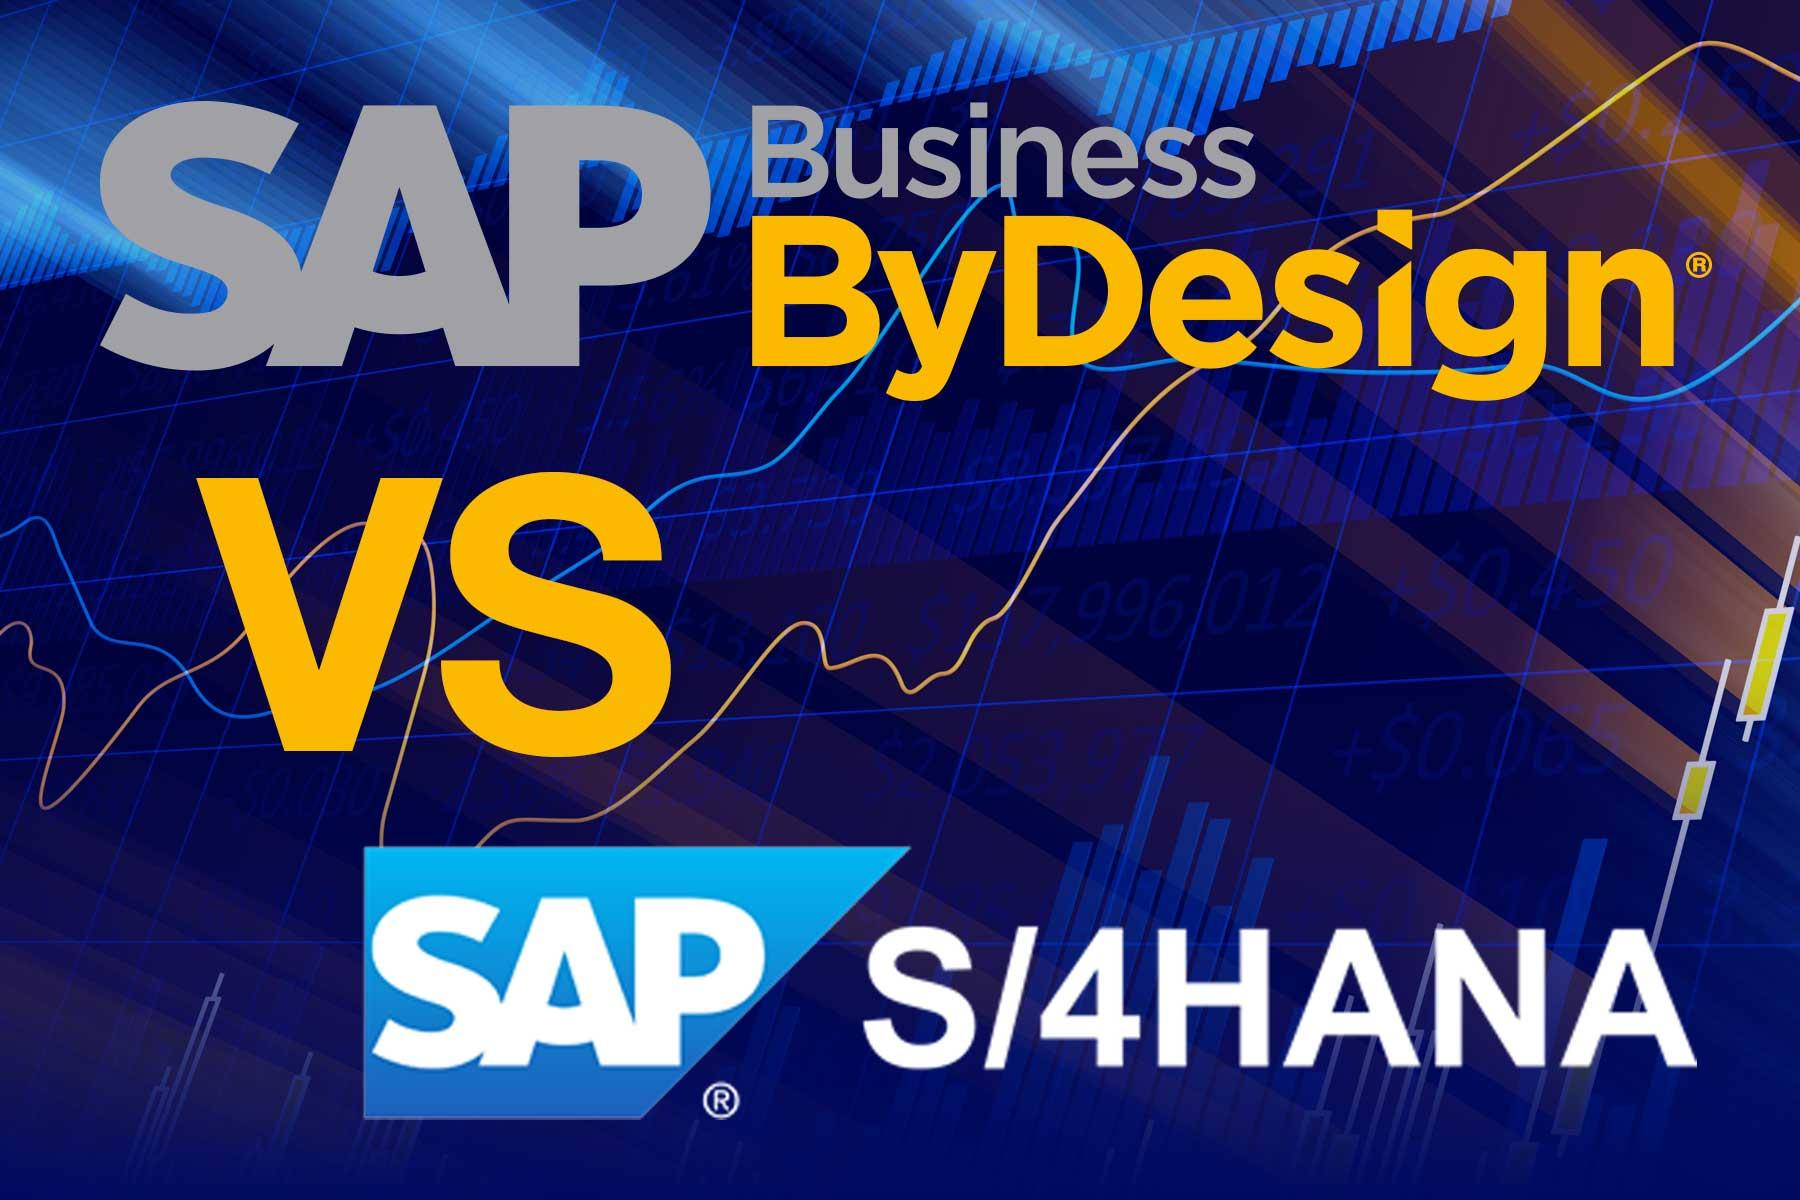 SAP Business ByDesign vs SAP S/4HANA